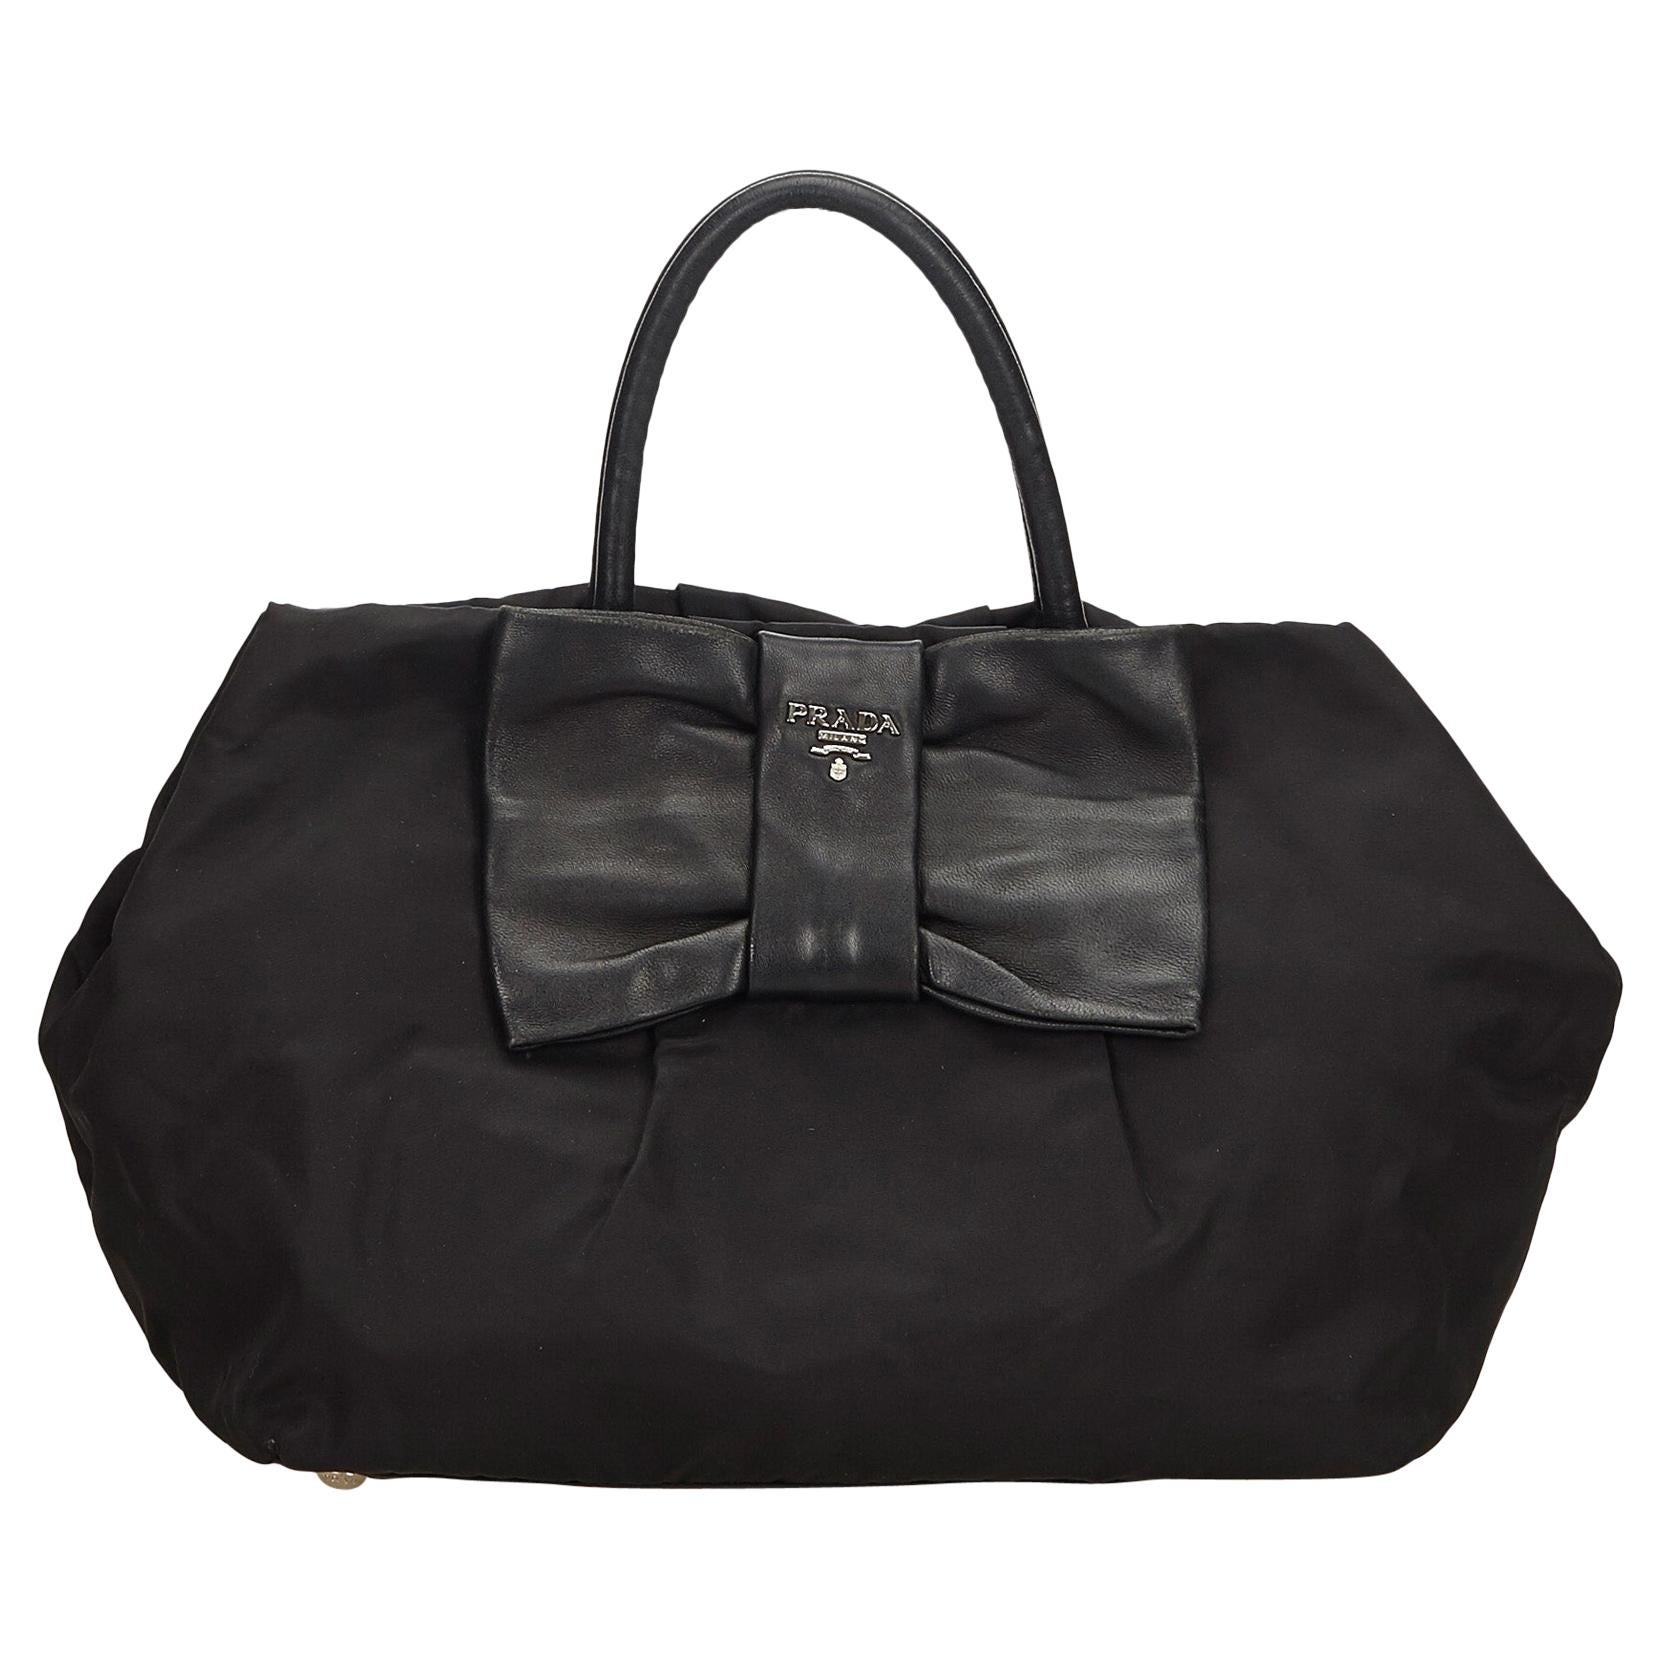 7b7dbaeddd96 Vintage Prada Handbags and Purses - 1,245 For Sale at 1stdibs